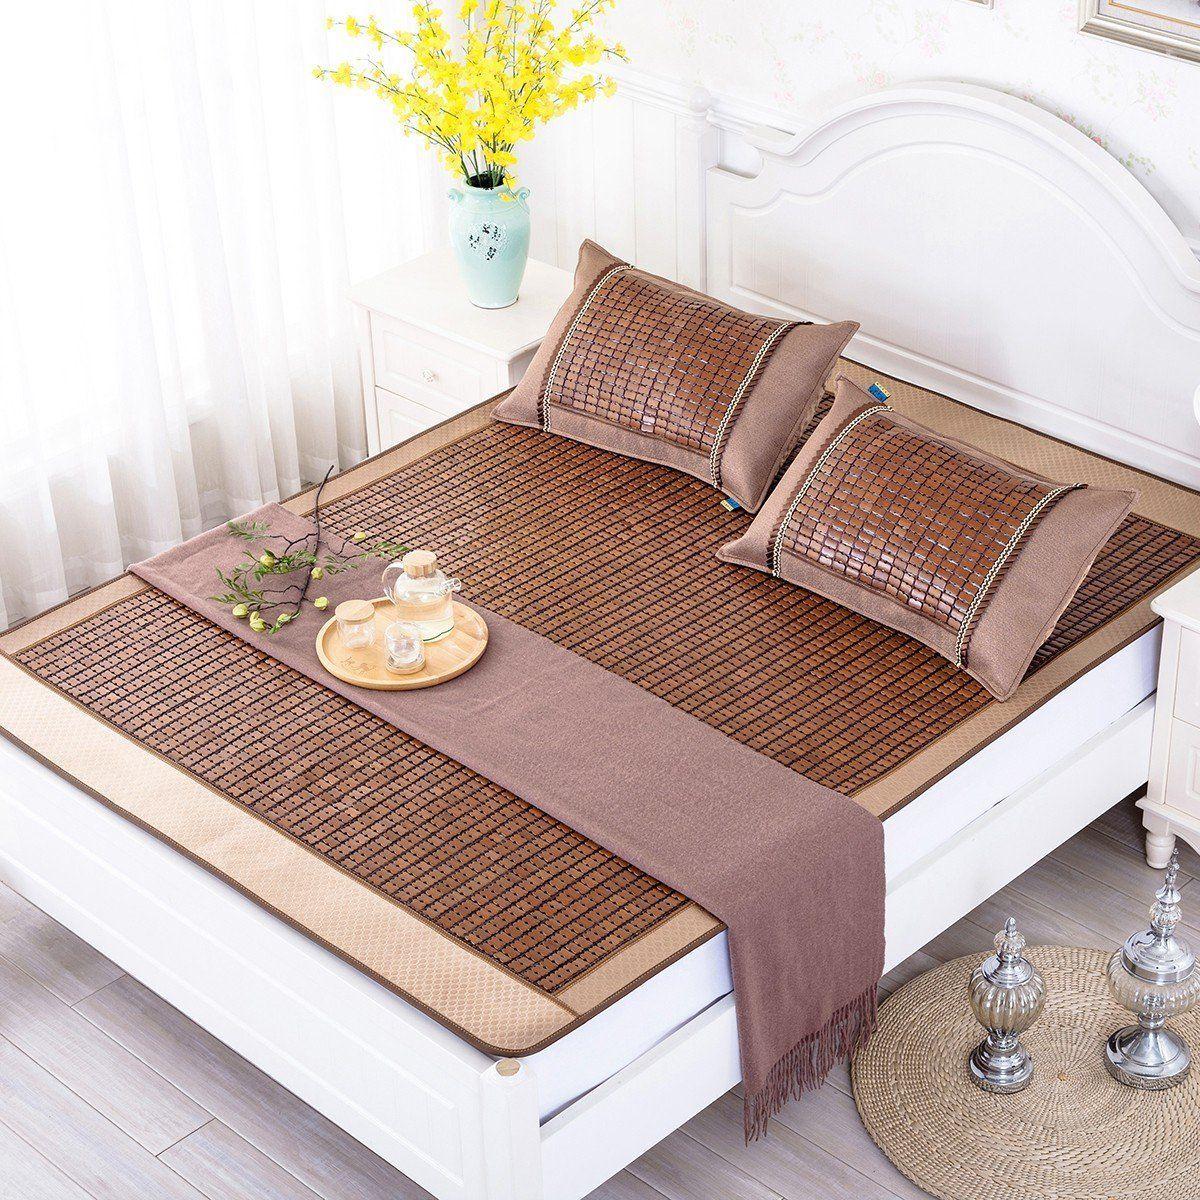 Qbedding Carbonized Bamboo Summer Sleeping Mat Cooling